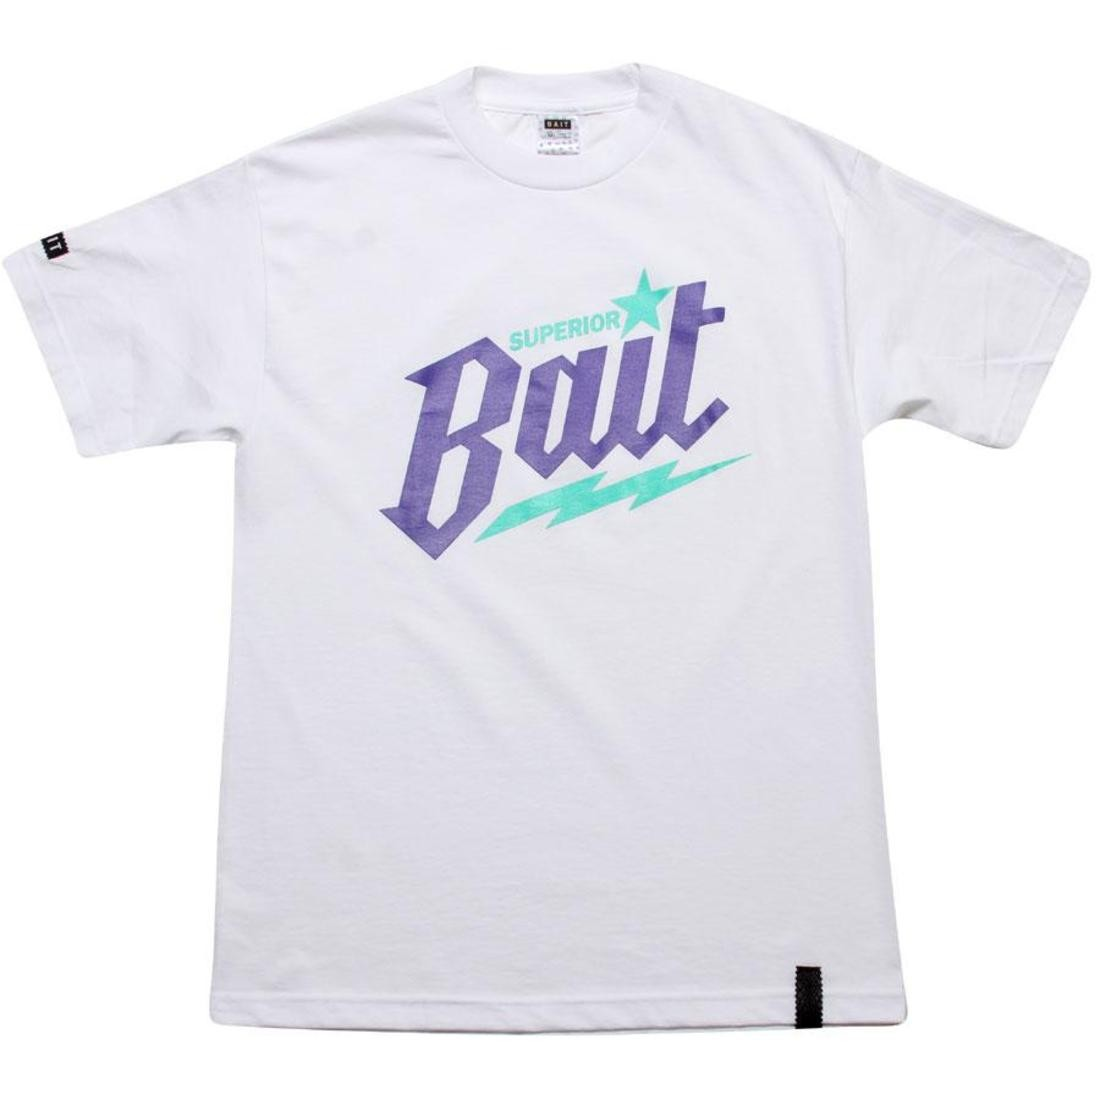 Tシャツ 紫 パープル 【 PURPLE BAIT SUPERIOR TEE GRAPE WHITE TEAL 】 メンズファッション トップス カットソー 送料無料